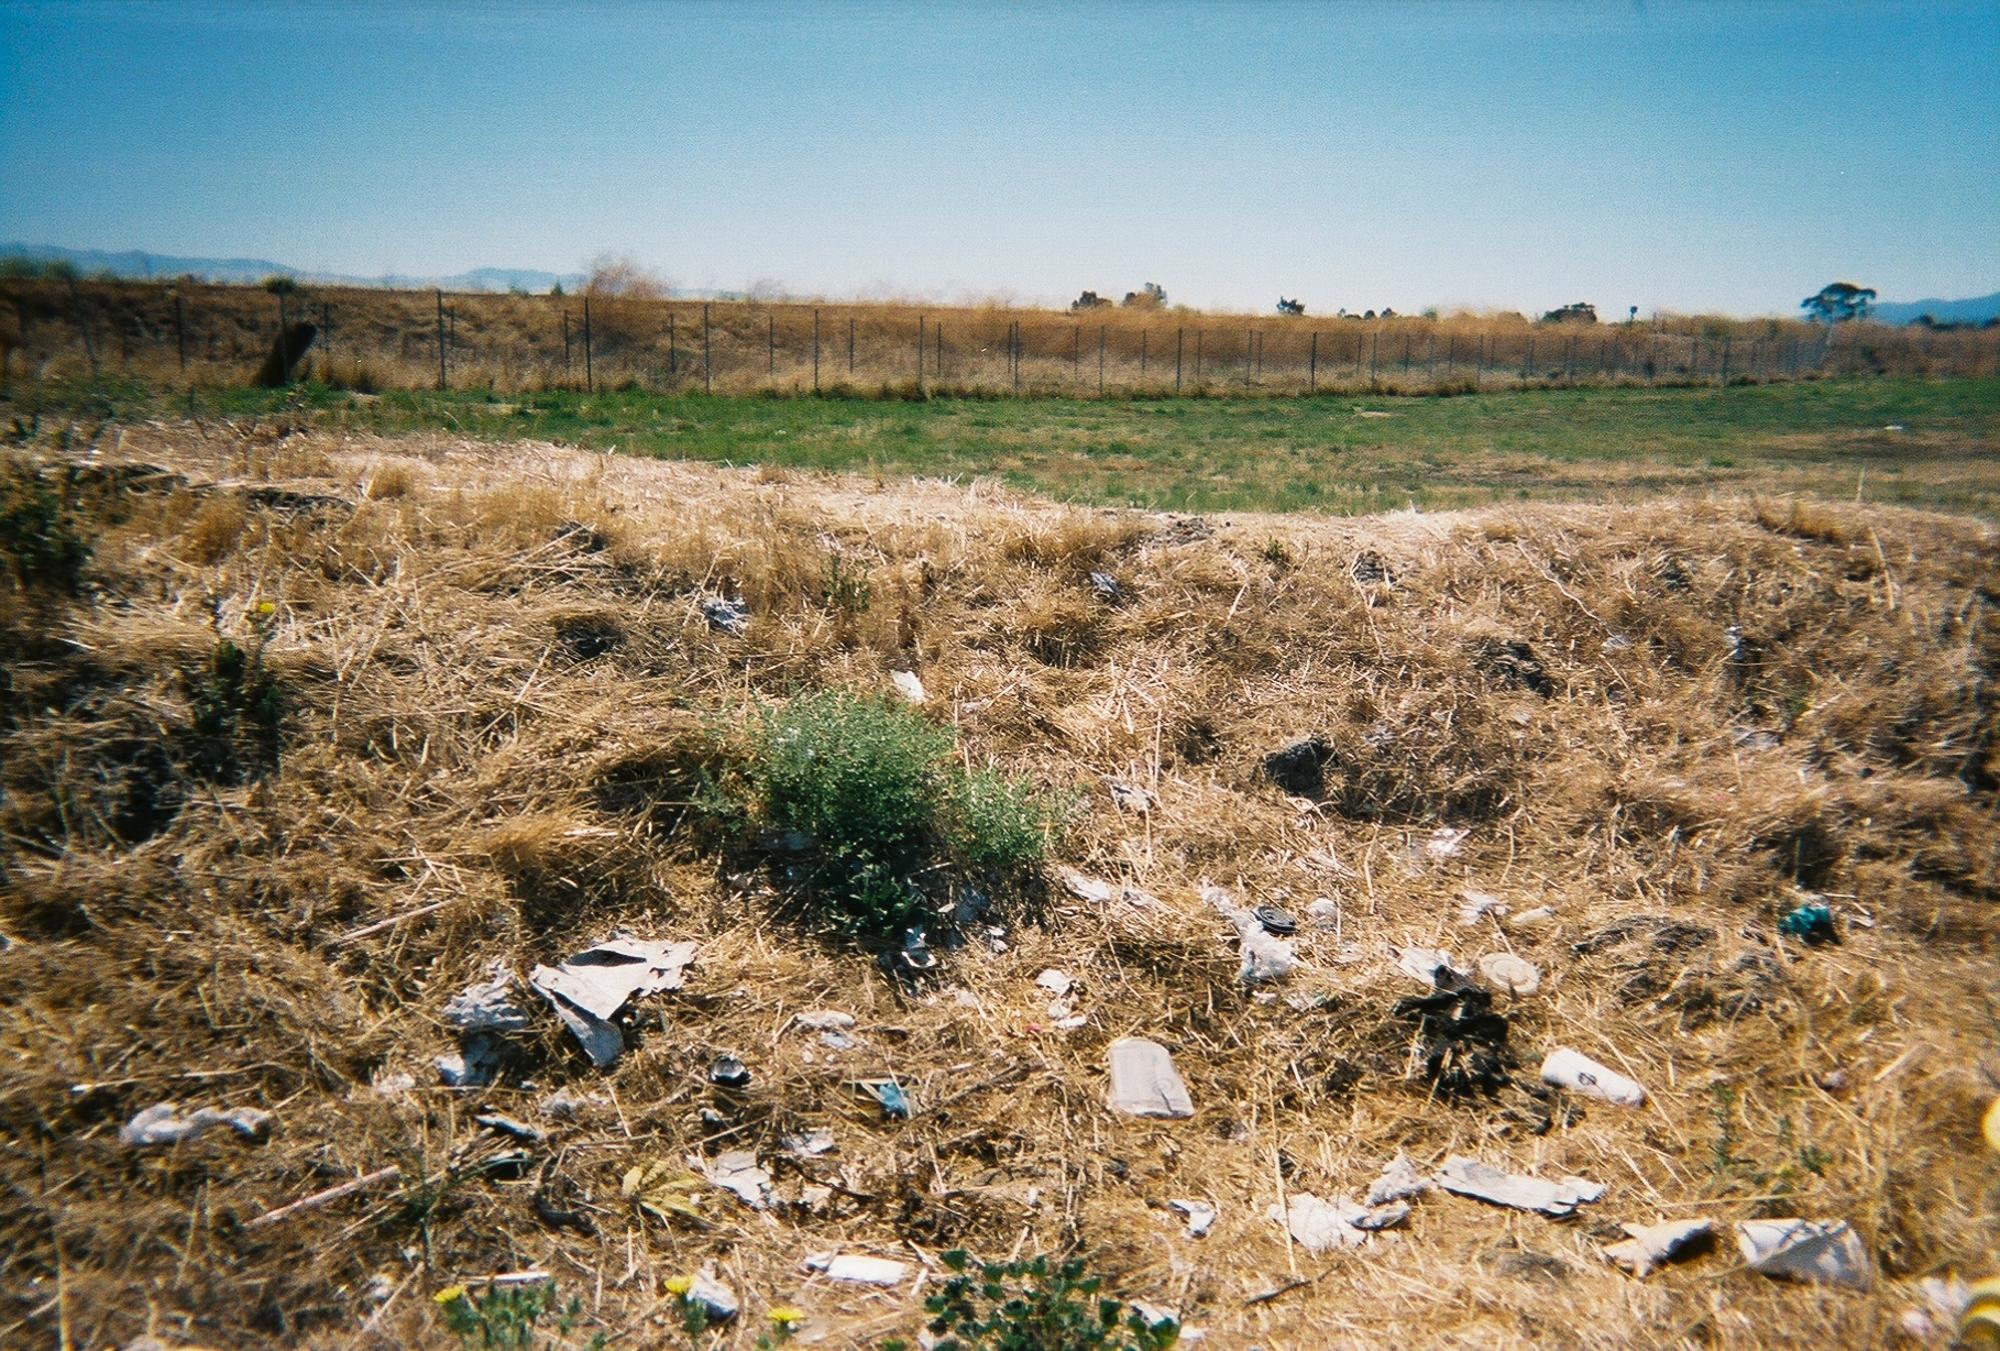 Trash and debris litter an open field in East Palo Alto. (Photo courtesy ofNathalia Arias.)